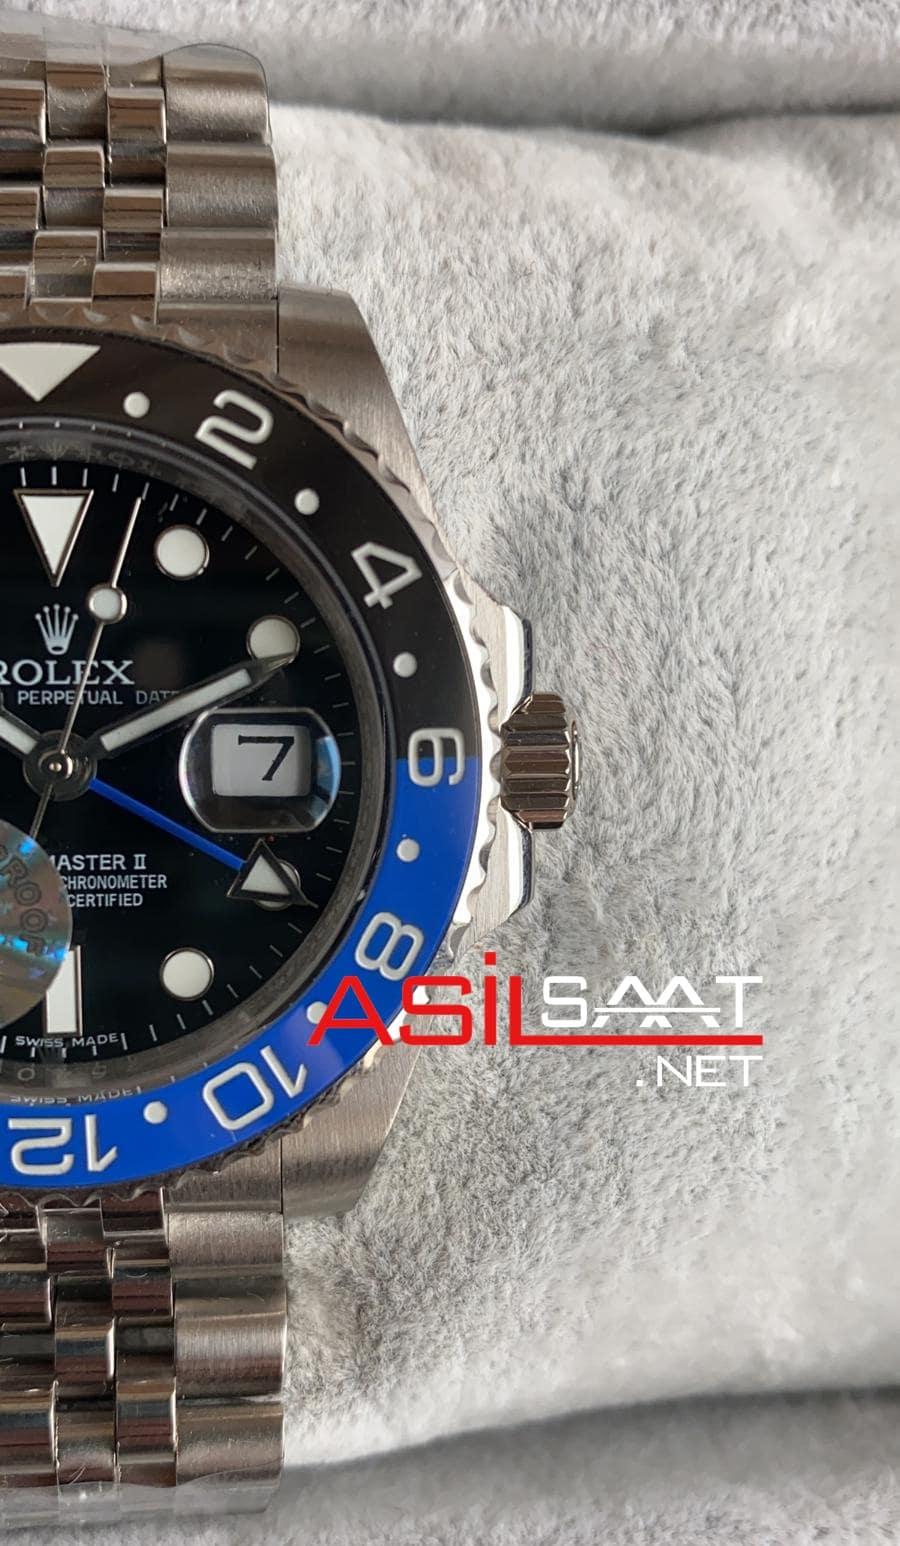 Rolex Jubilee Oyster Perpetual Gmt Master II Batman Silver Replika Saat ROLG007